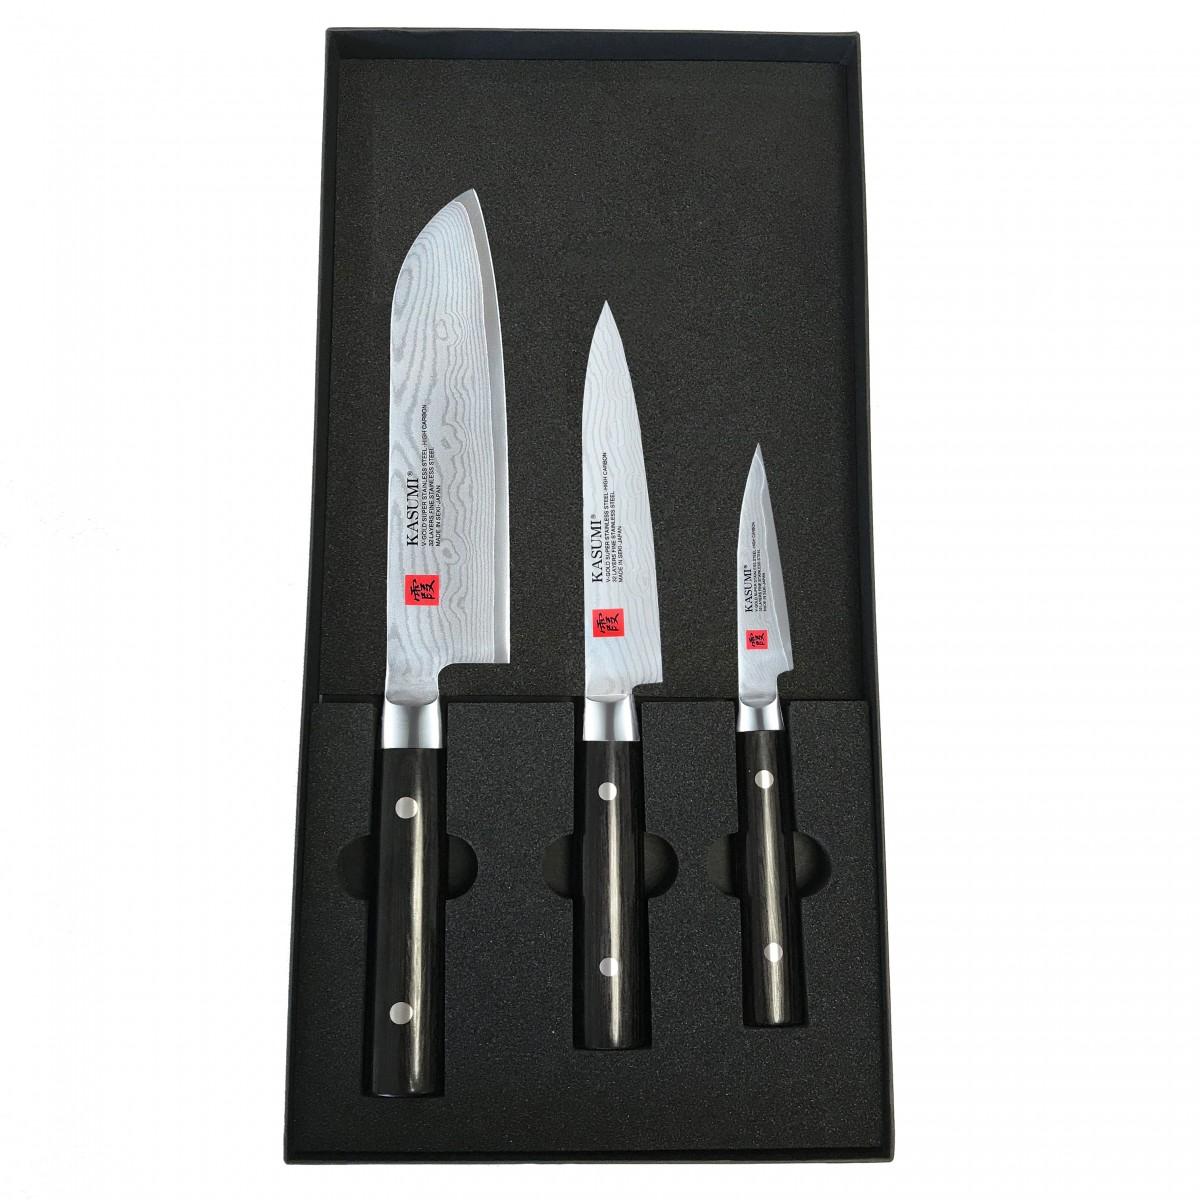 Coffret Kasumi Damas avec couteau Santoku 18 cm